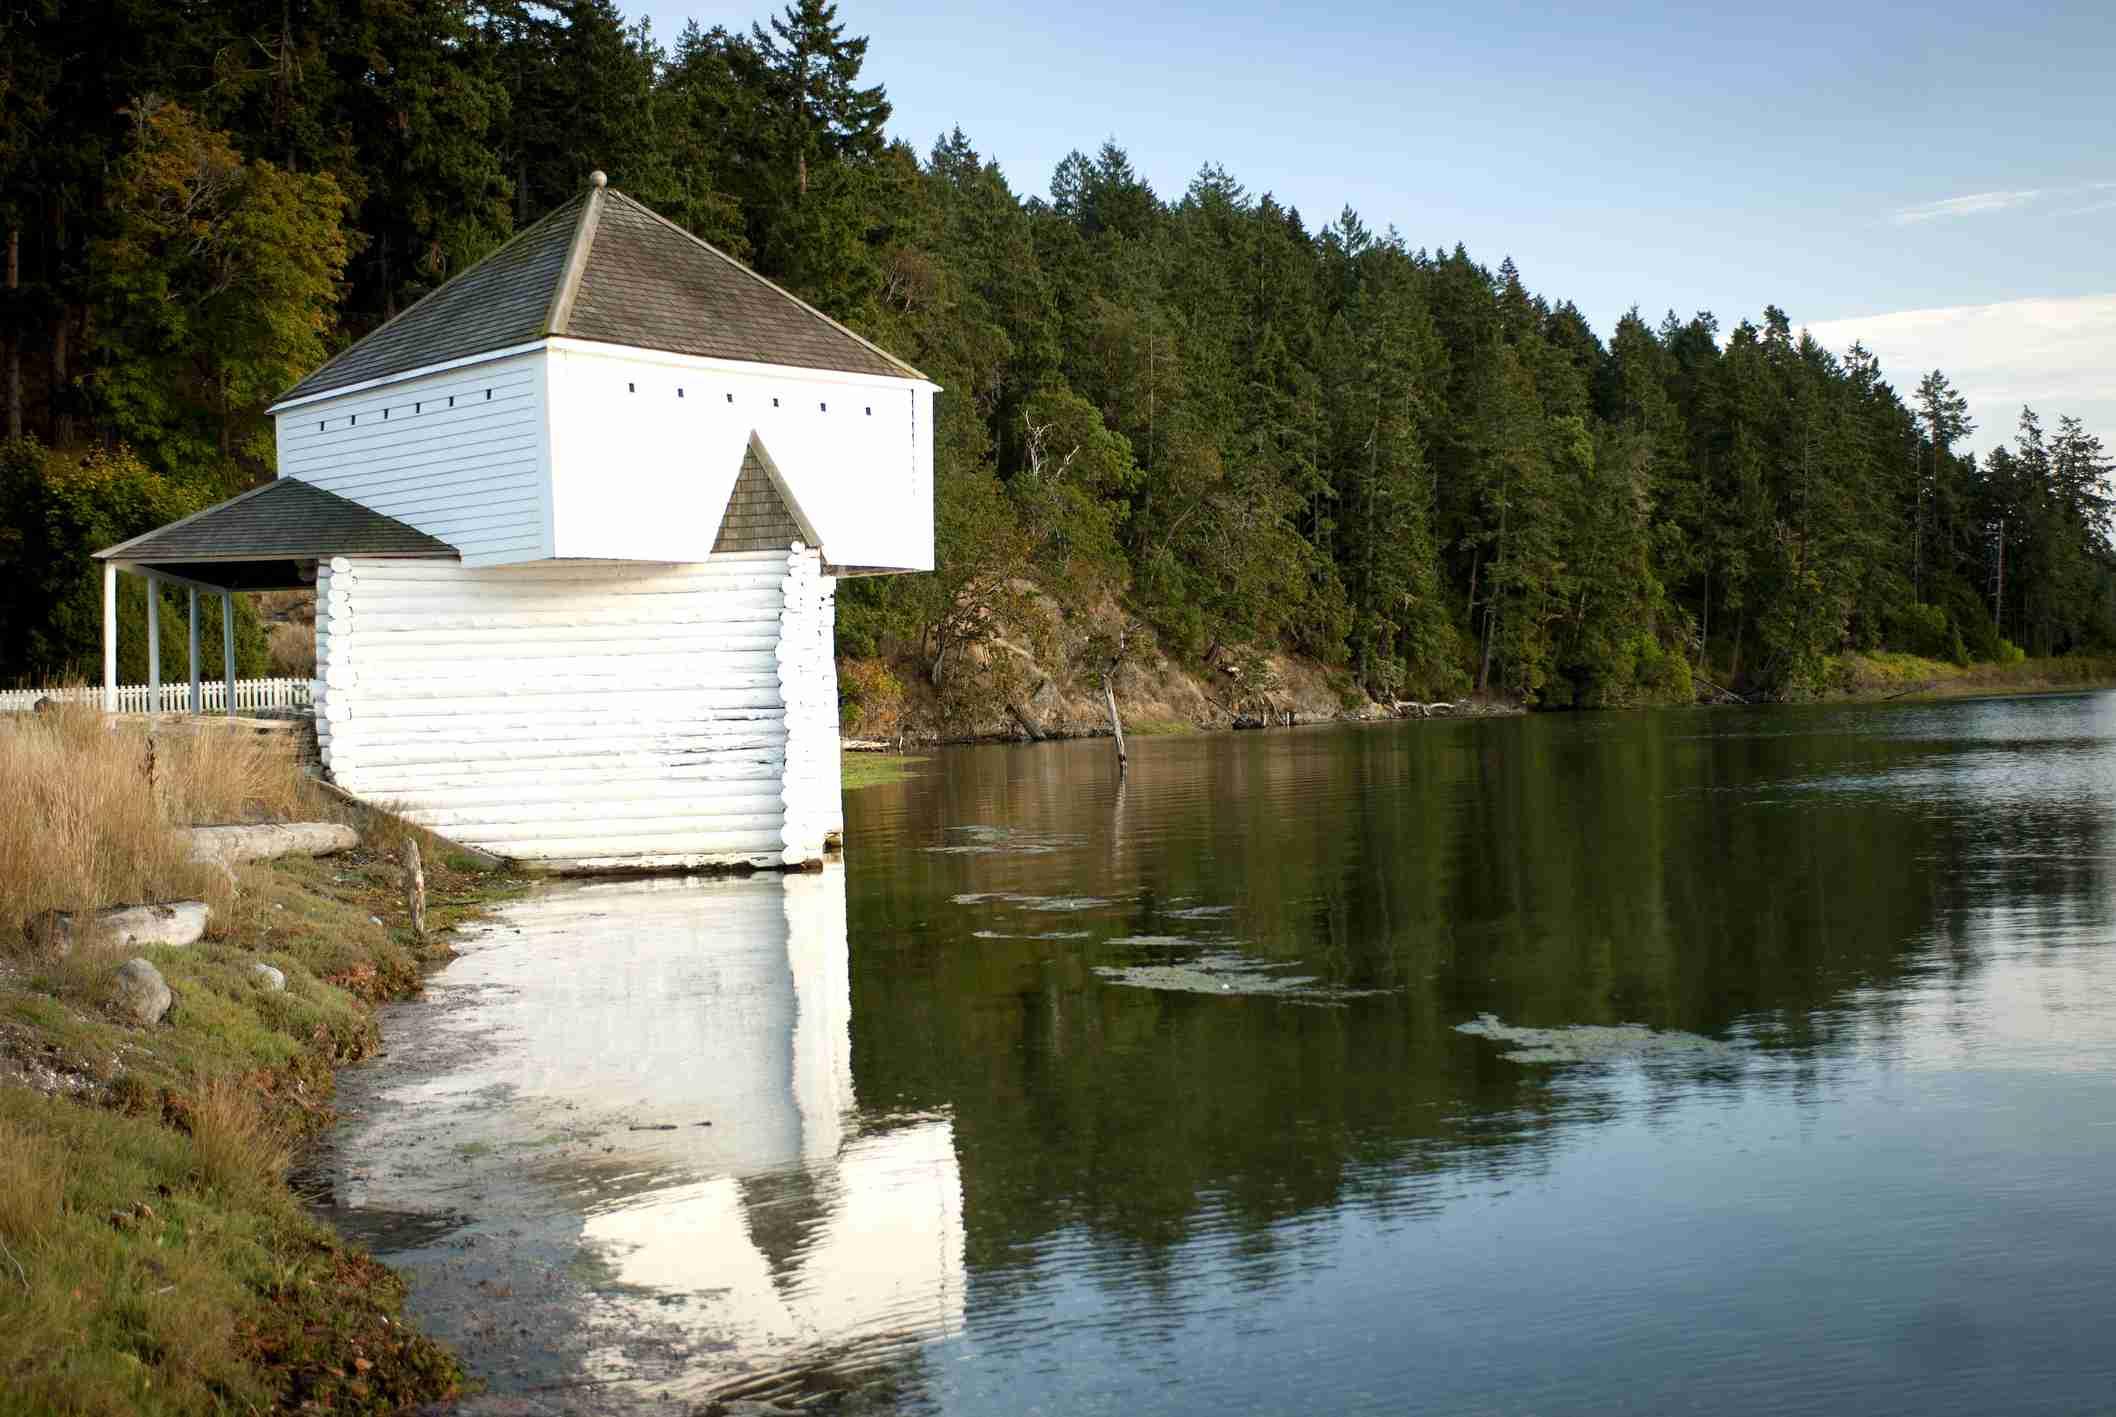 Taman Bersejarah Nasional San Juan Island;  Pulau San Juan;  Washington State